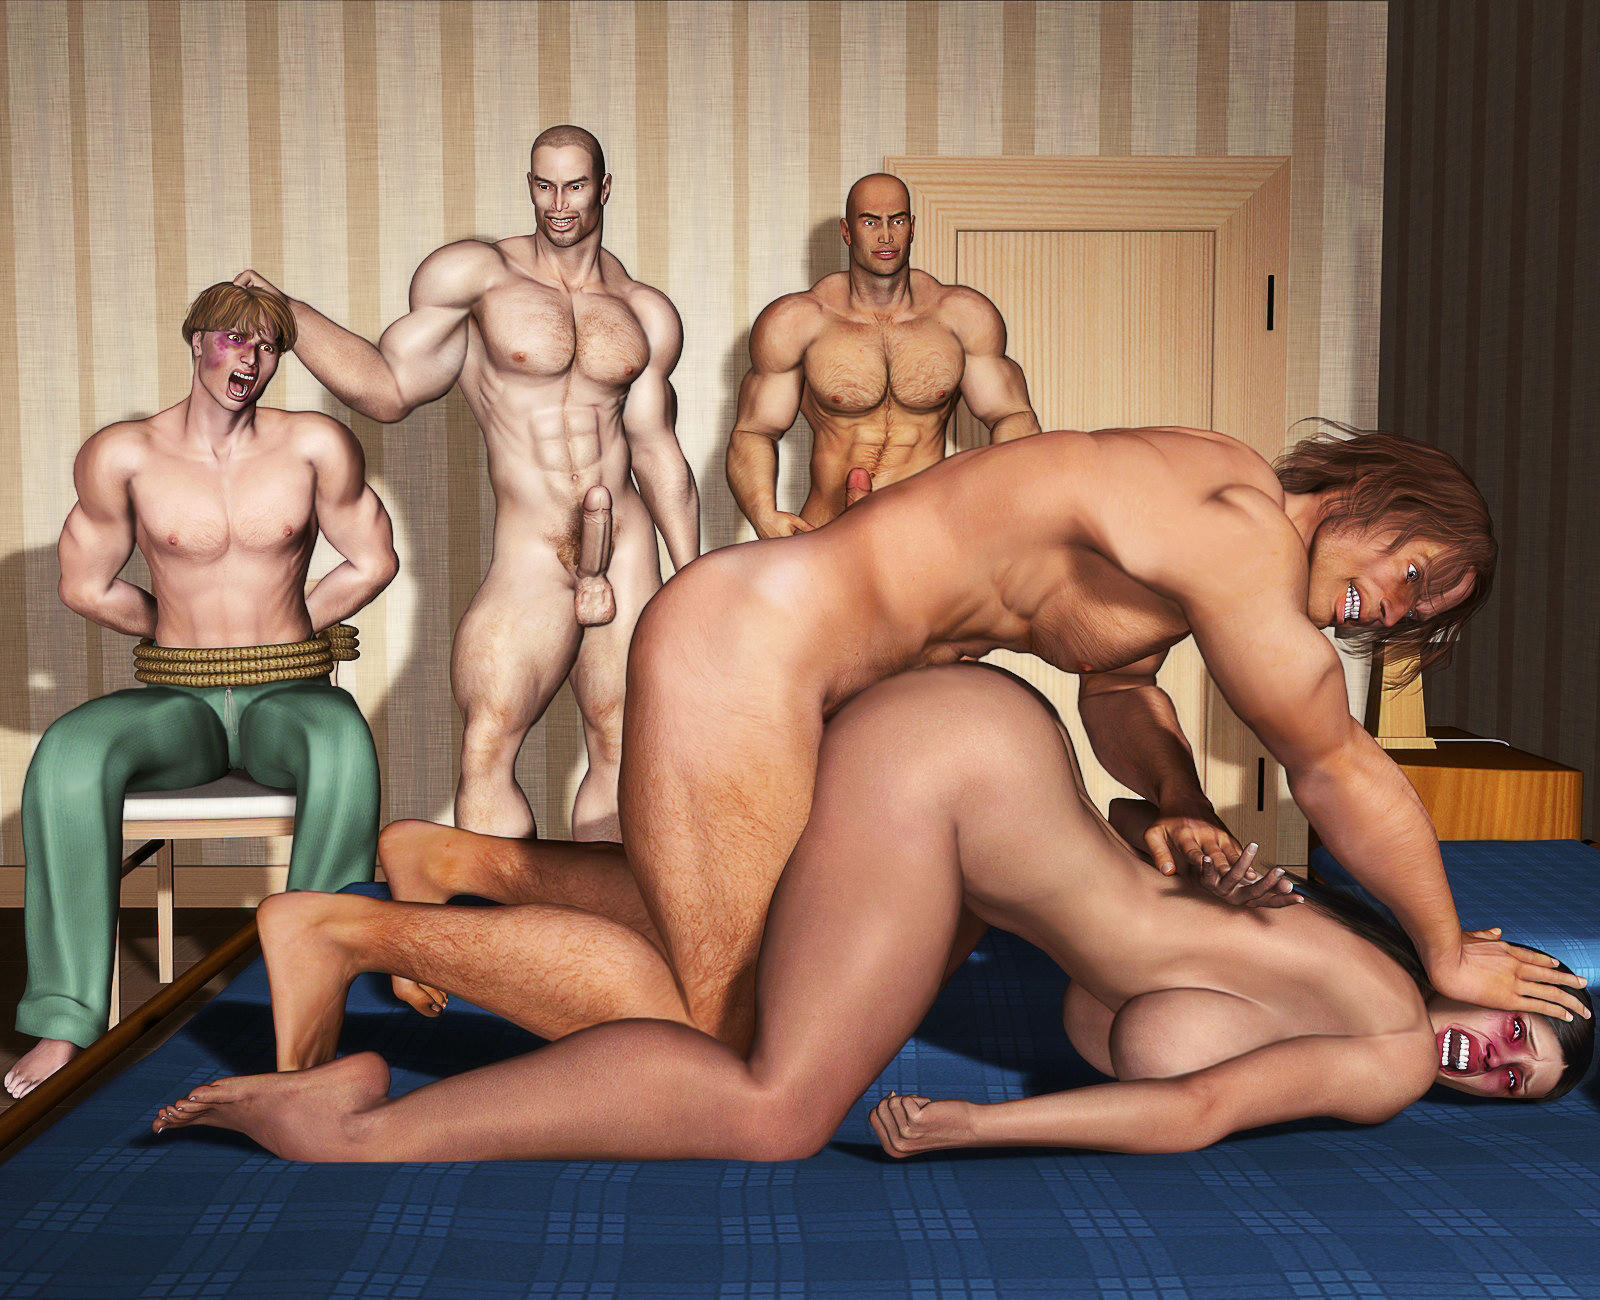 Секс эротика жестоки 9 фотография